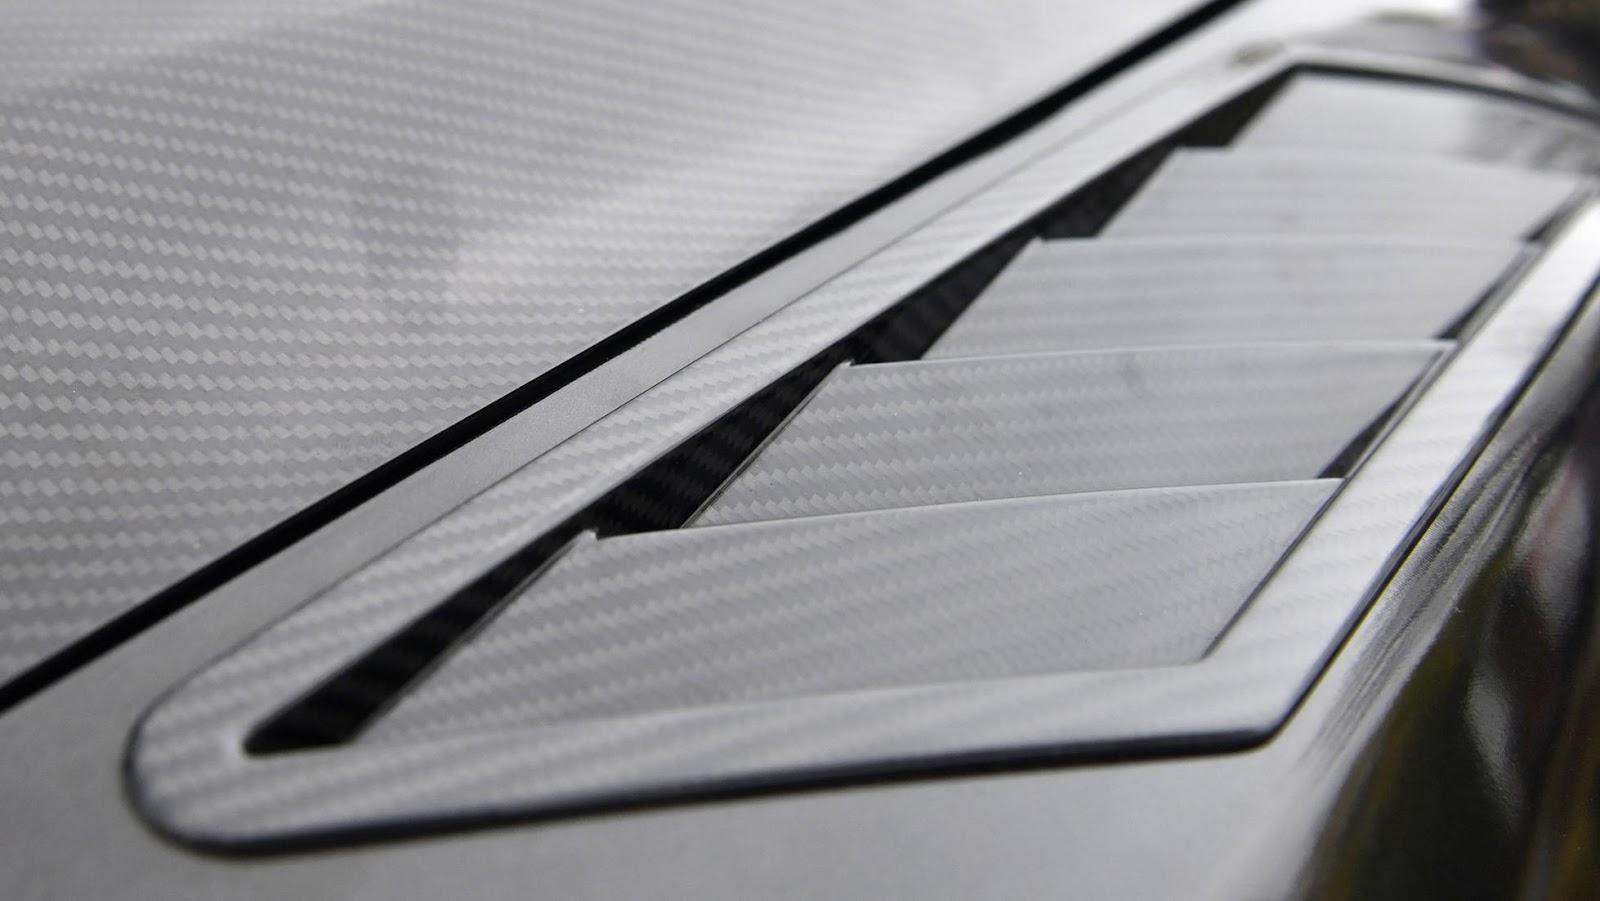 Litchfield-Nissan-GT-R-Nurburgring-9